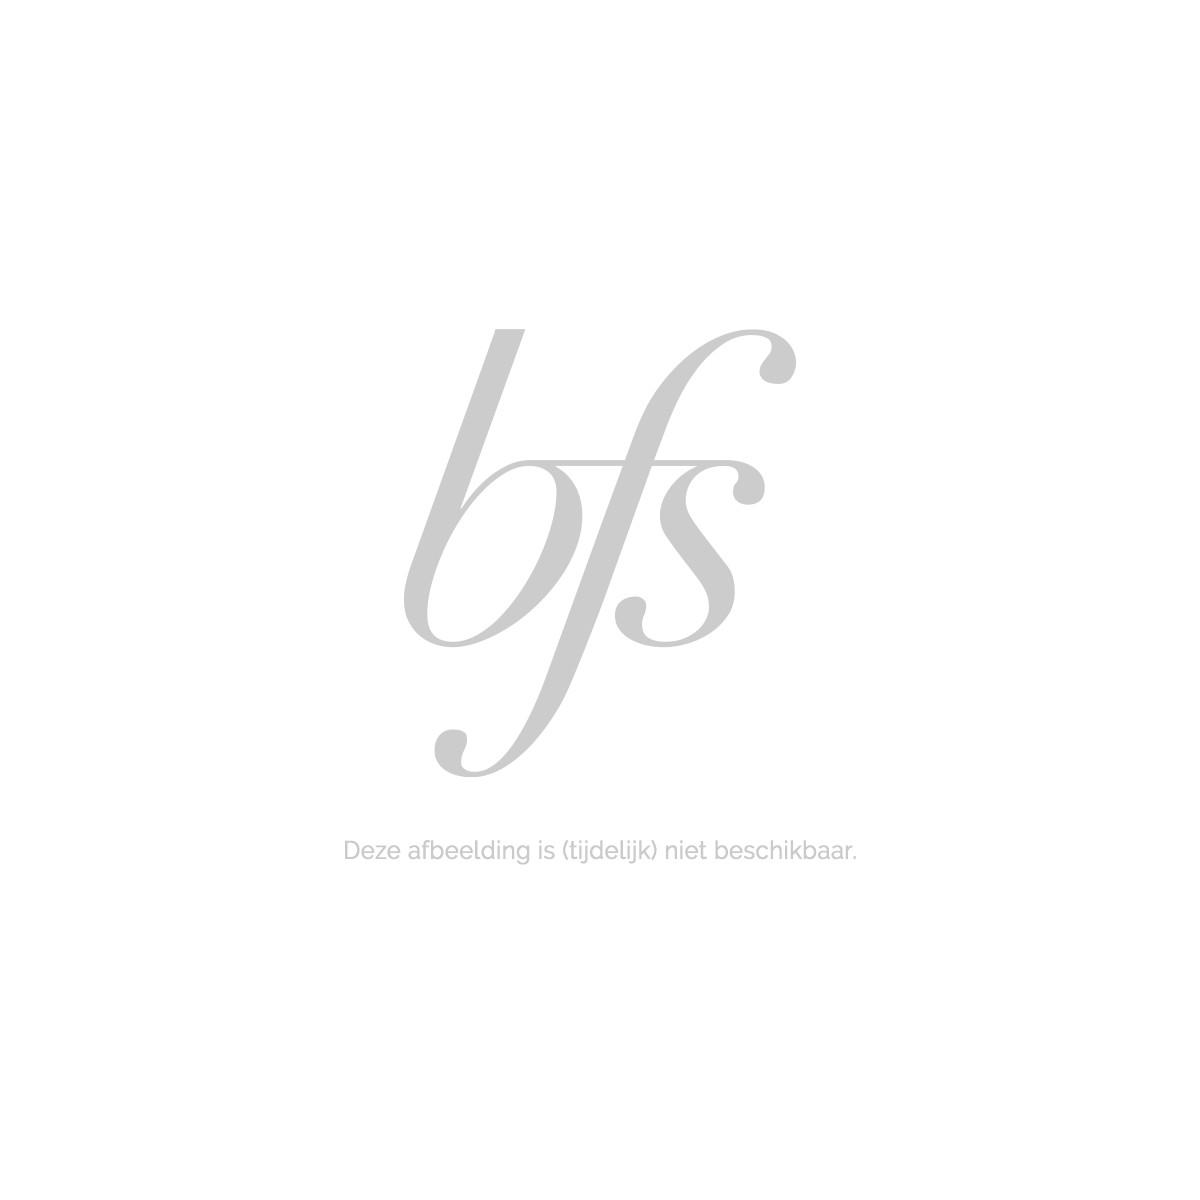 Afbeelding van Borlind Beauty Shot Anti Age Revitalizer 15ml